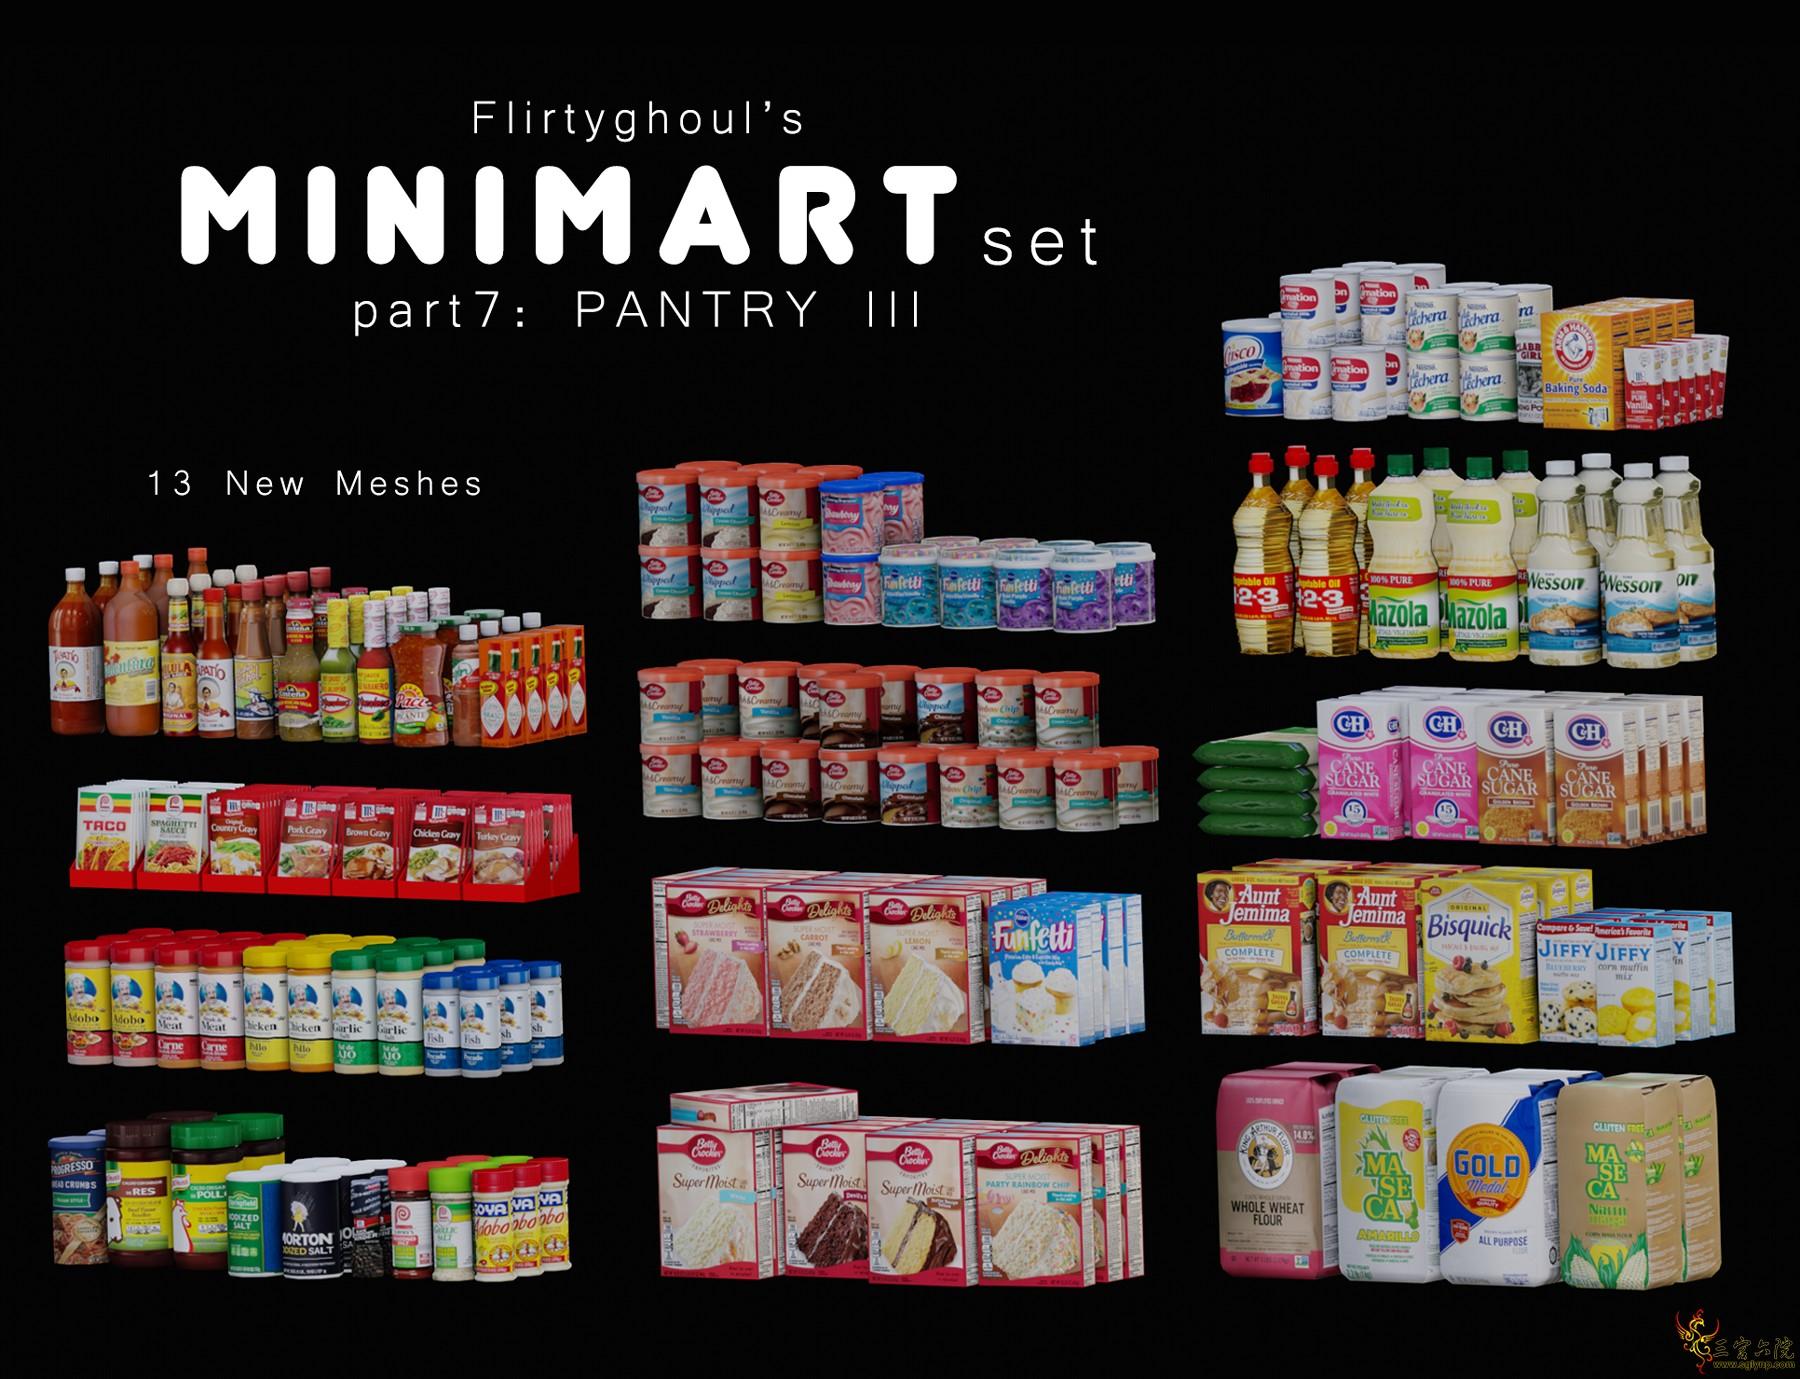 FG_Minimart_PART7_PANTRY3SET_prev2.png